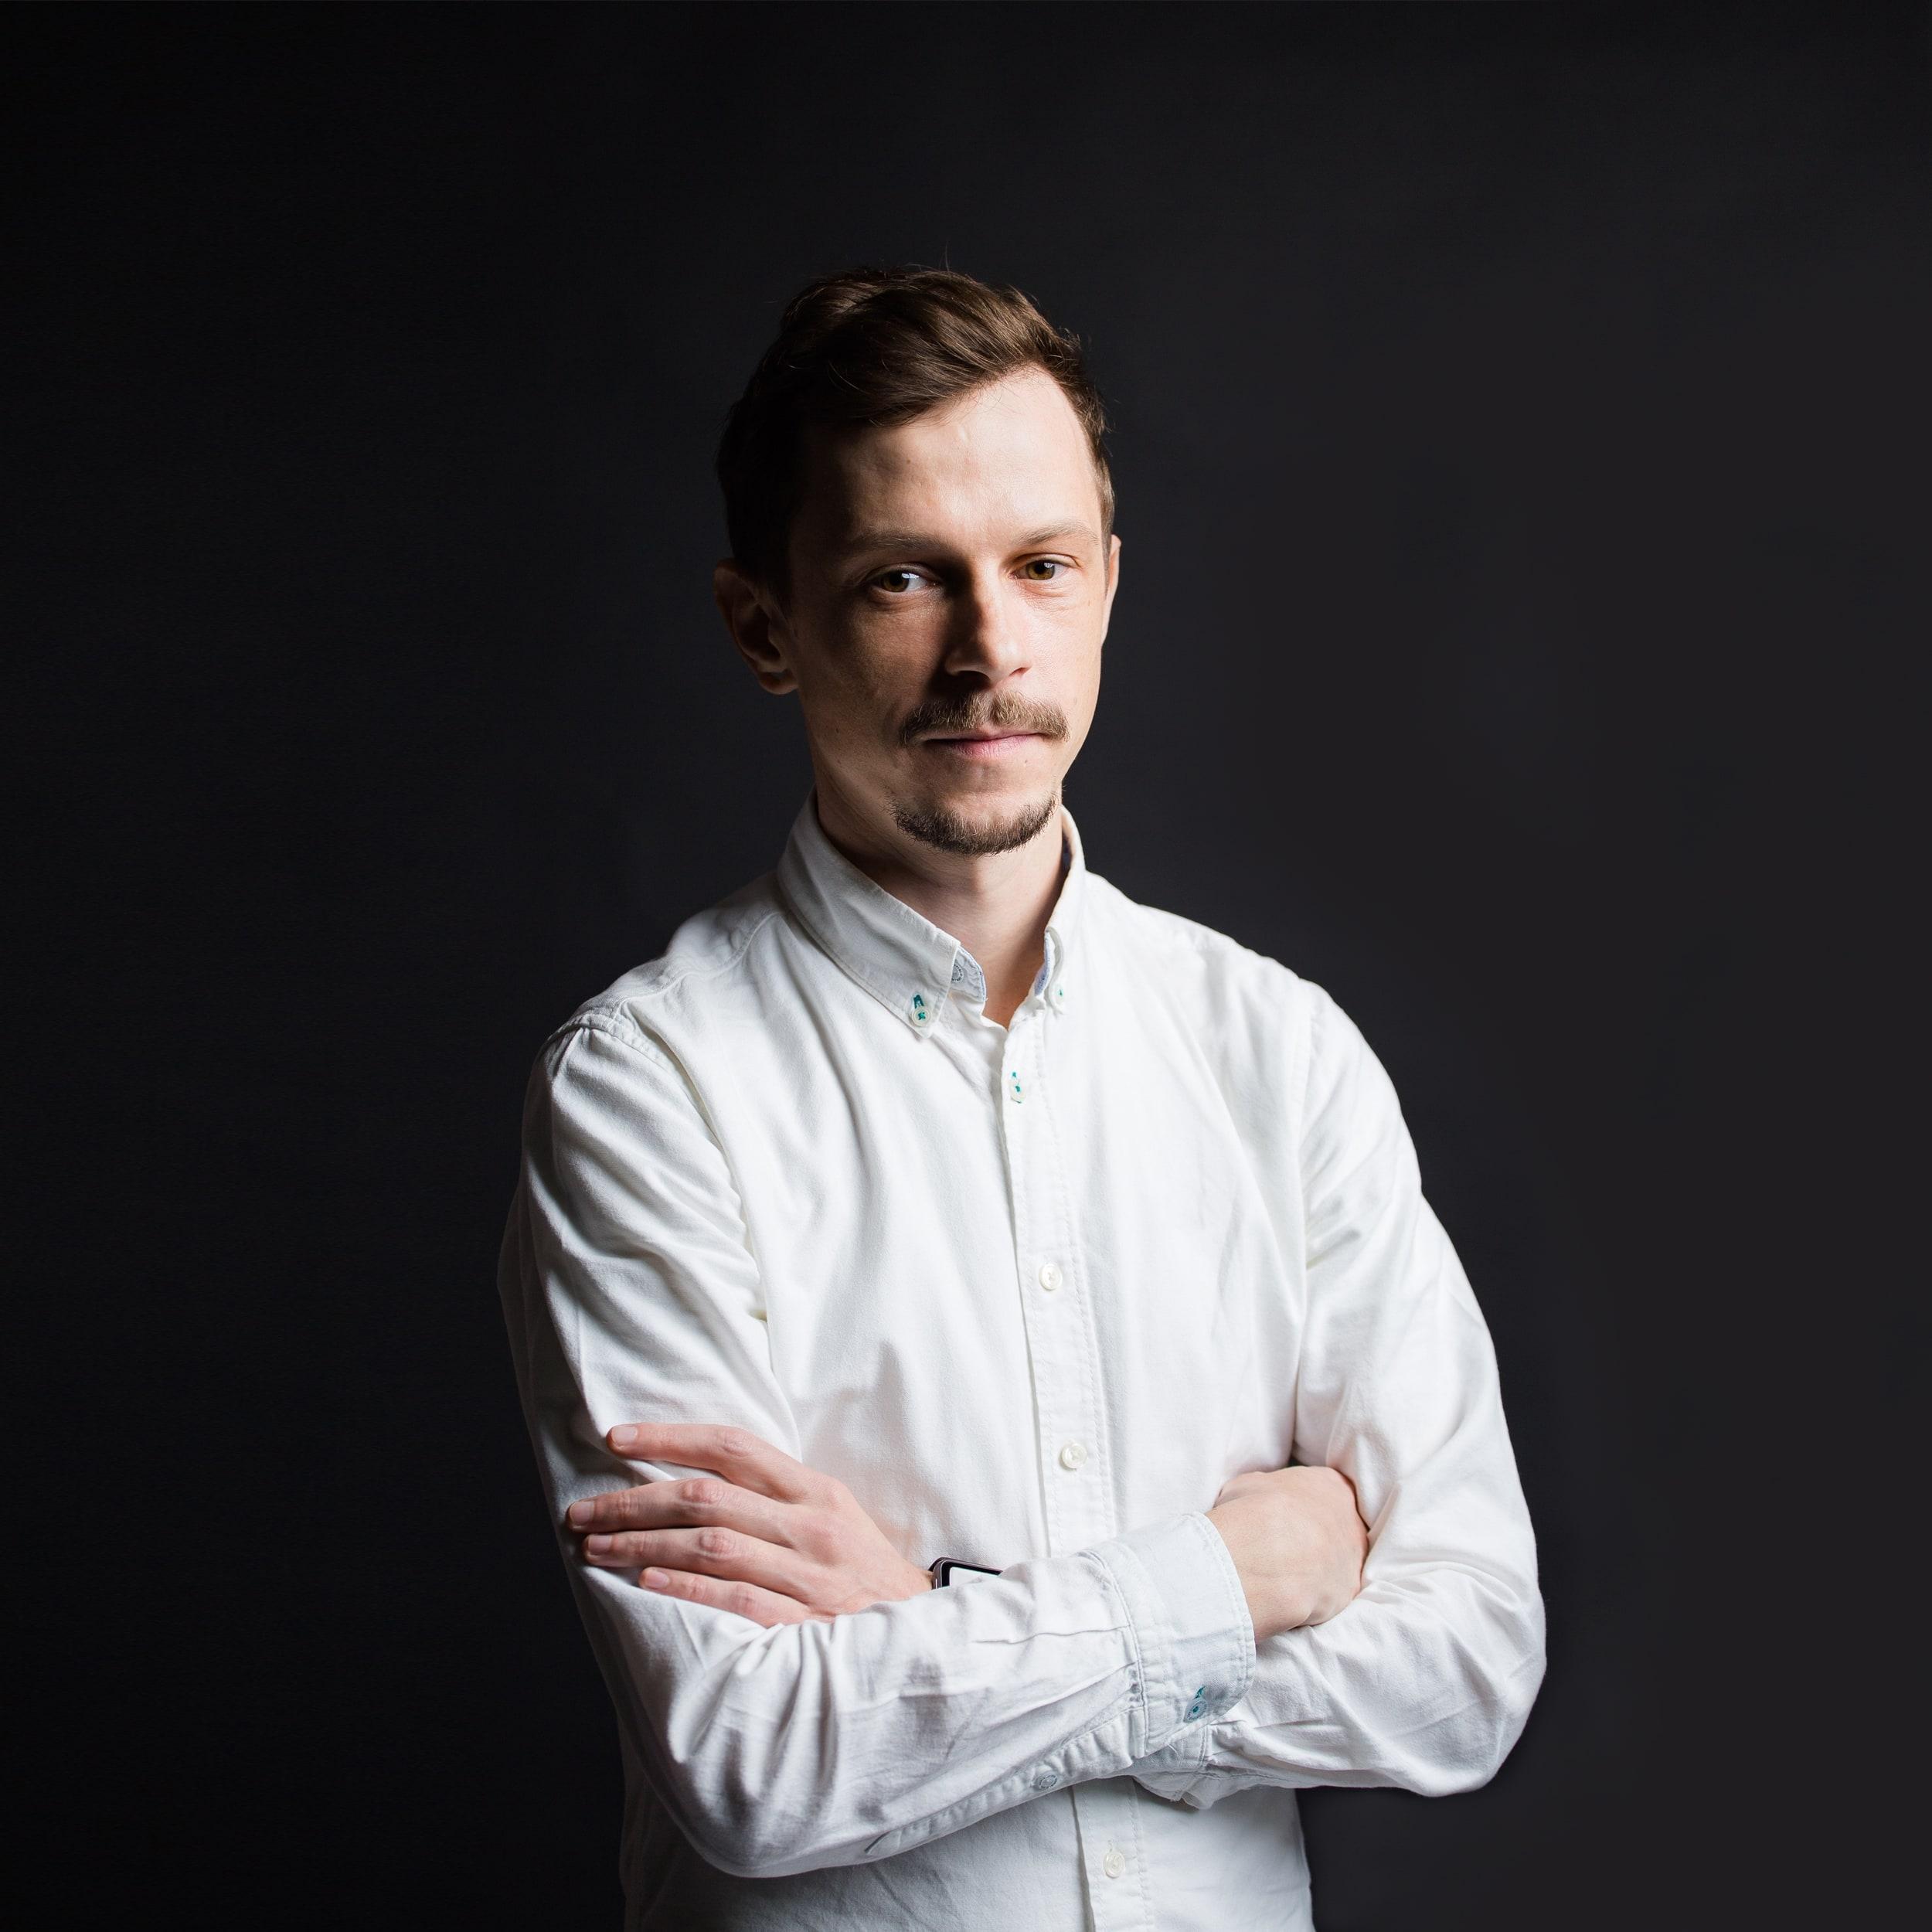 designer Pavel Vetrov